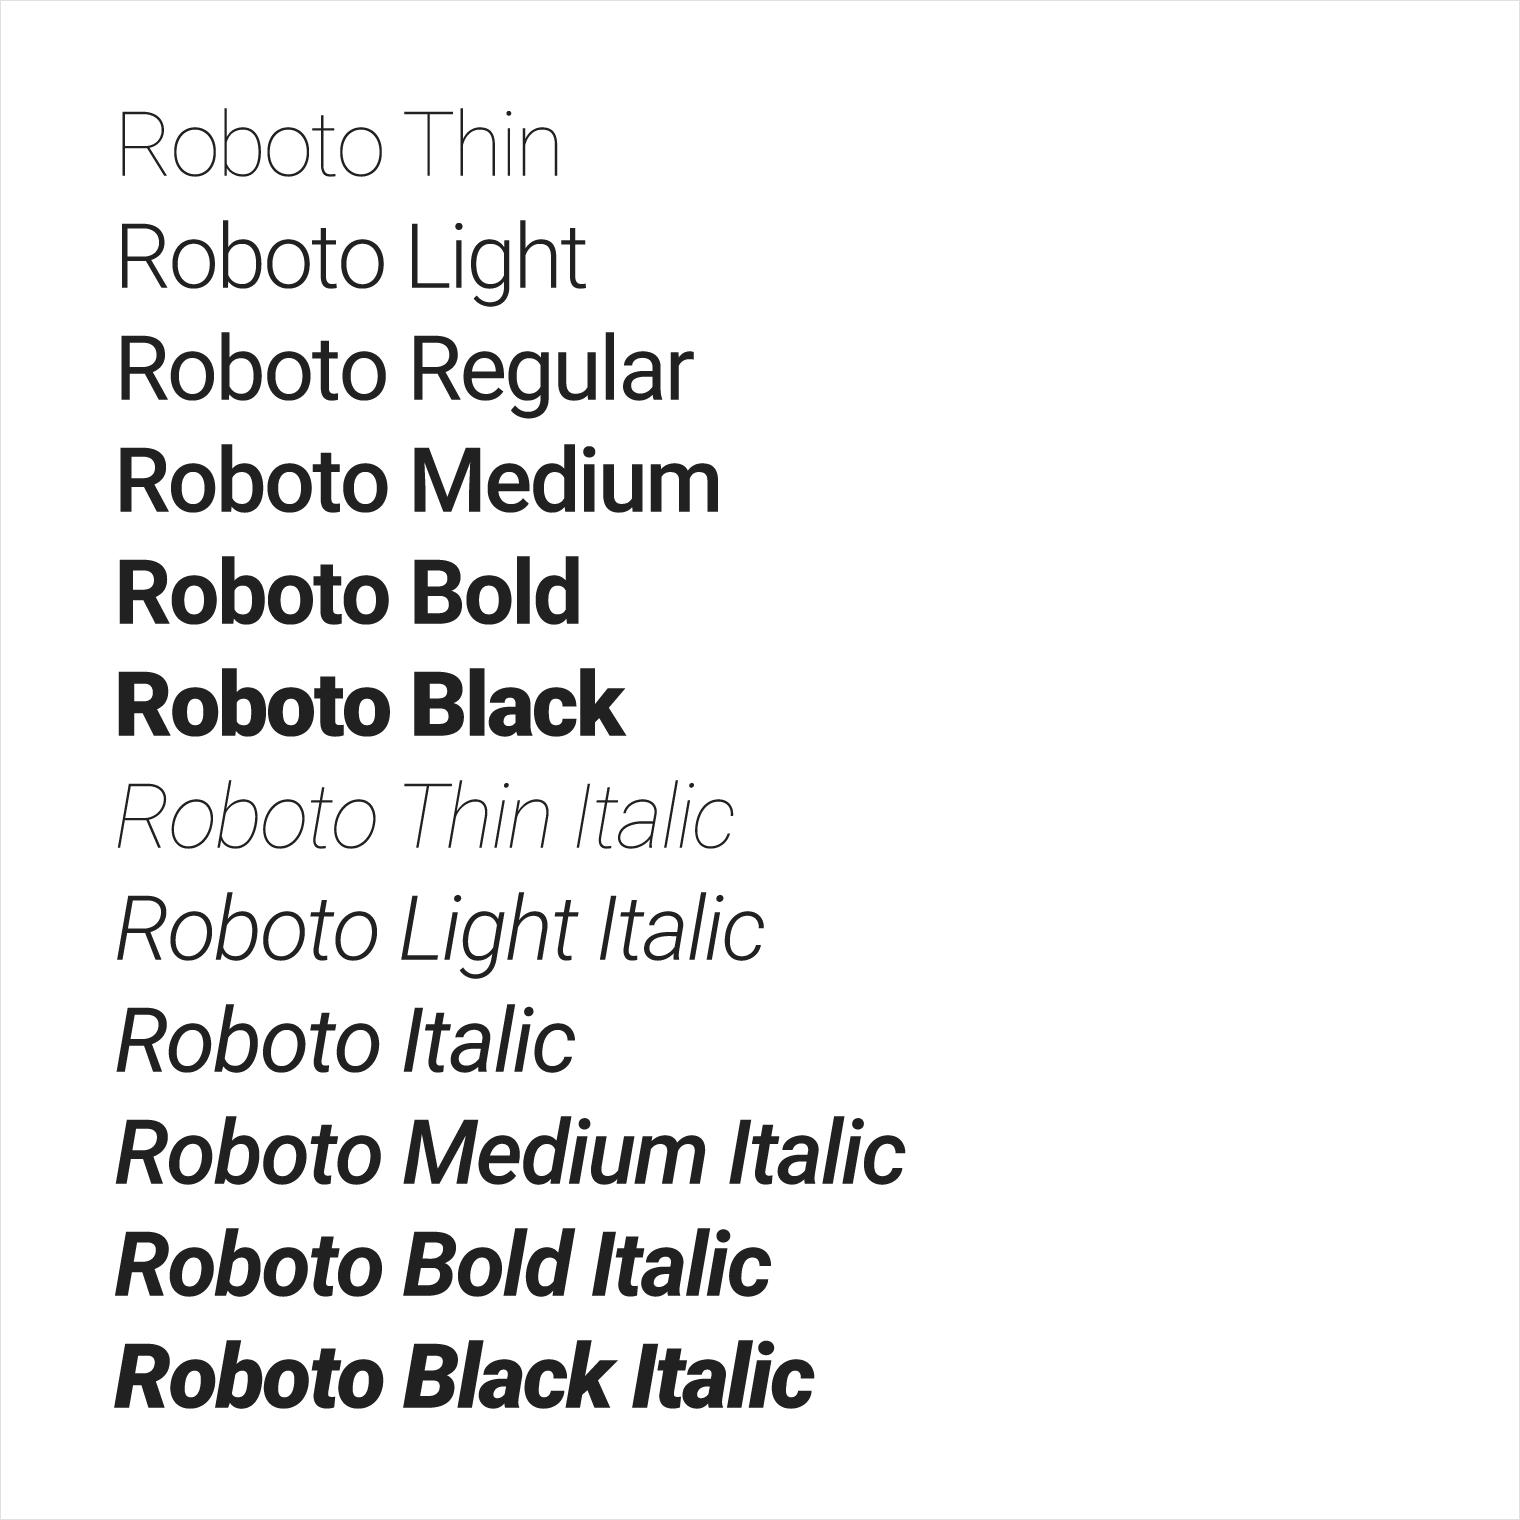 Roboto font weight look wrong? : webdev